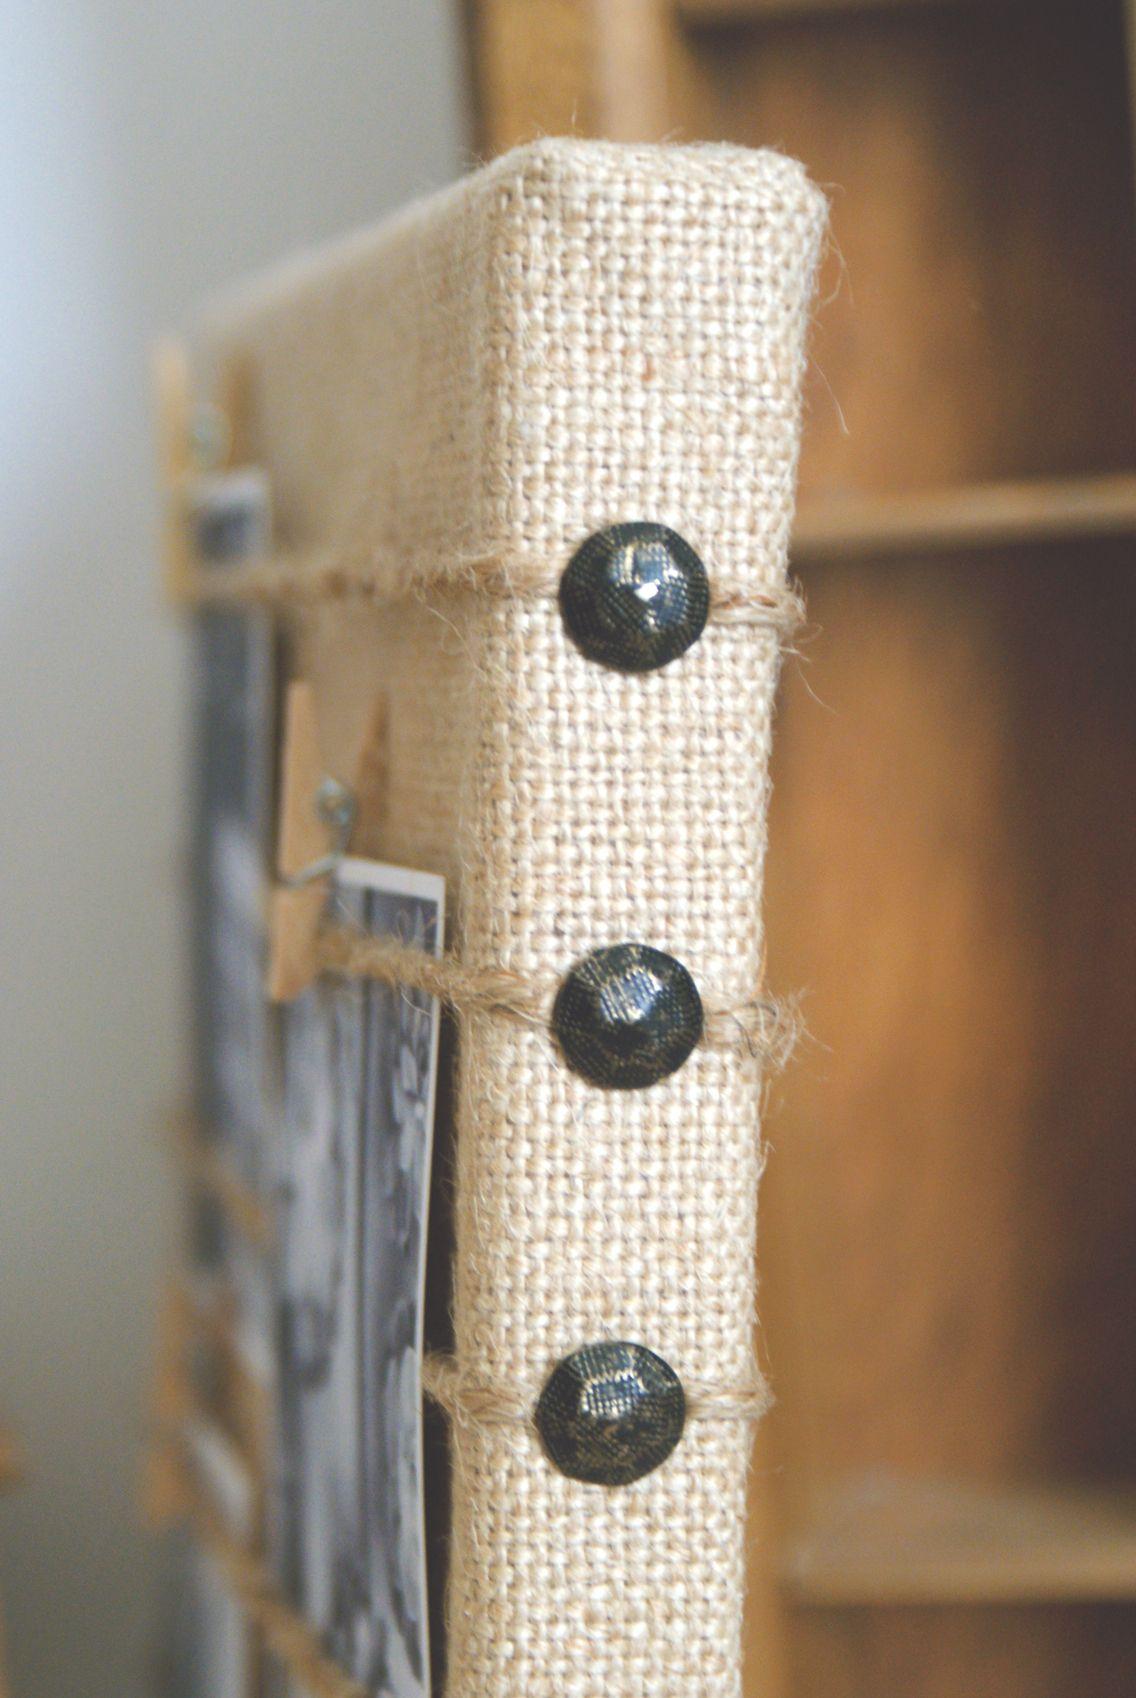 Burlap Craft Ideas For Christmas Part - 45: DIY Burlap Memo Board